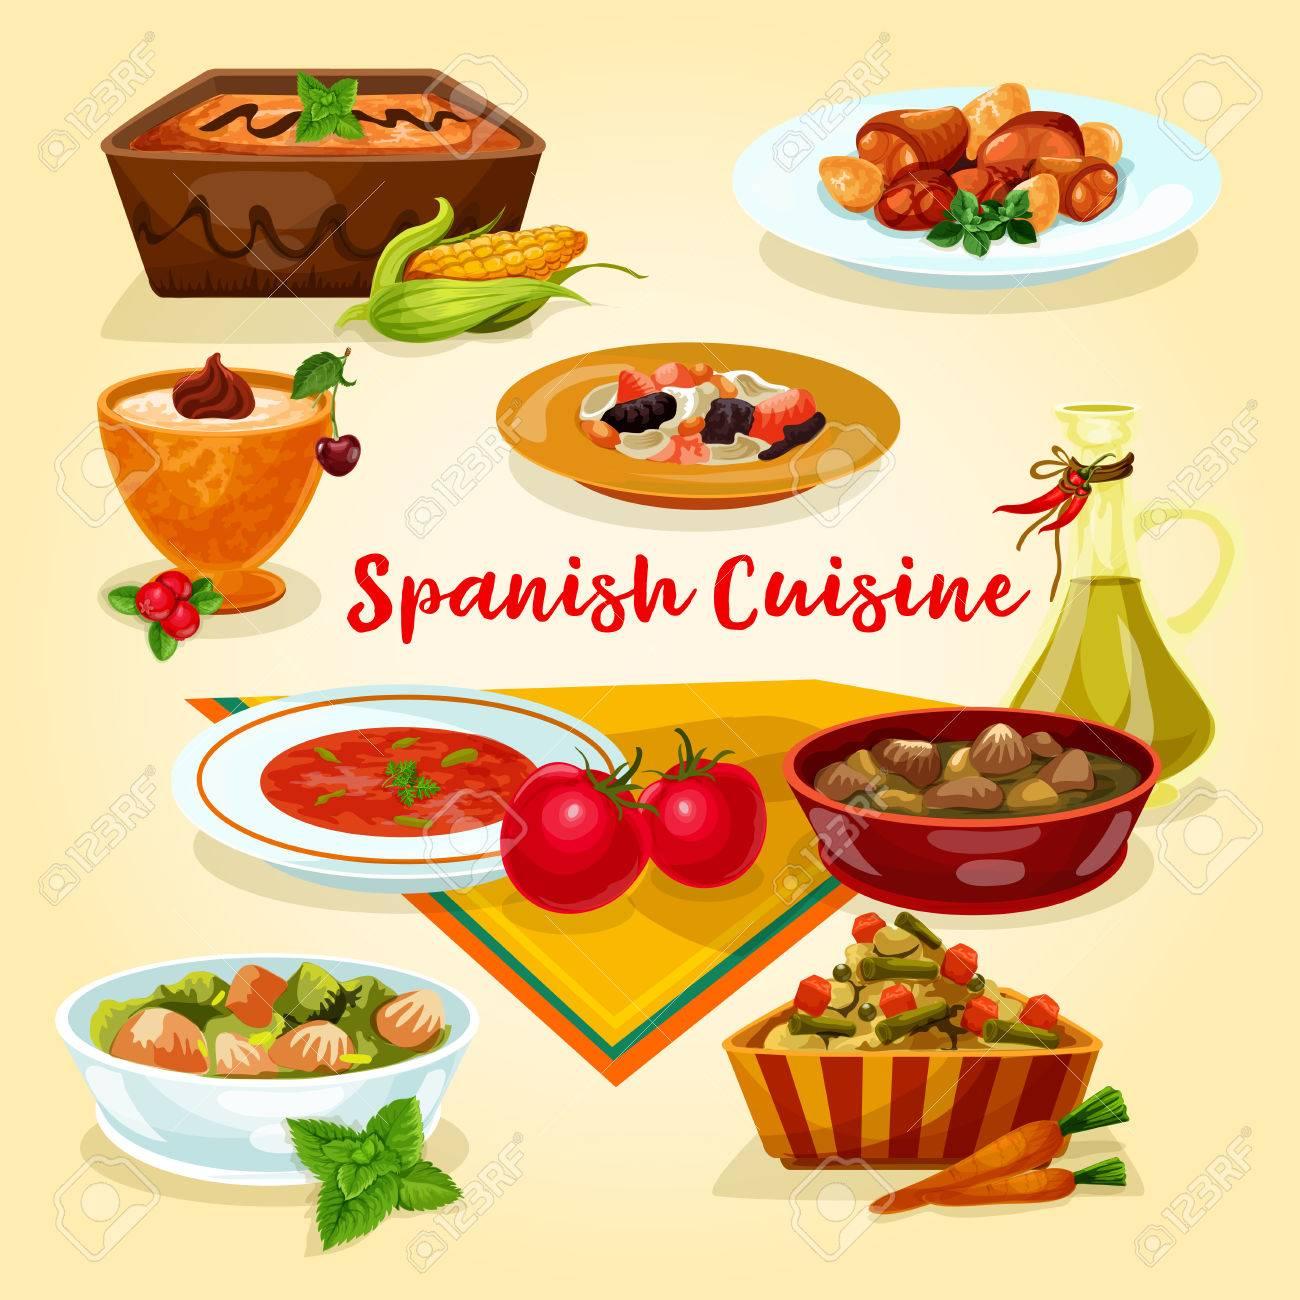 Cocina Española Sabrosa Cena Platos Icono De Dibujos Animados. Carne ...